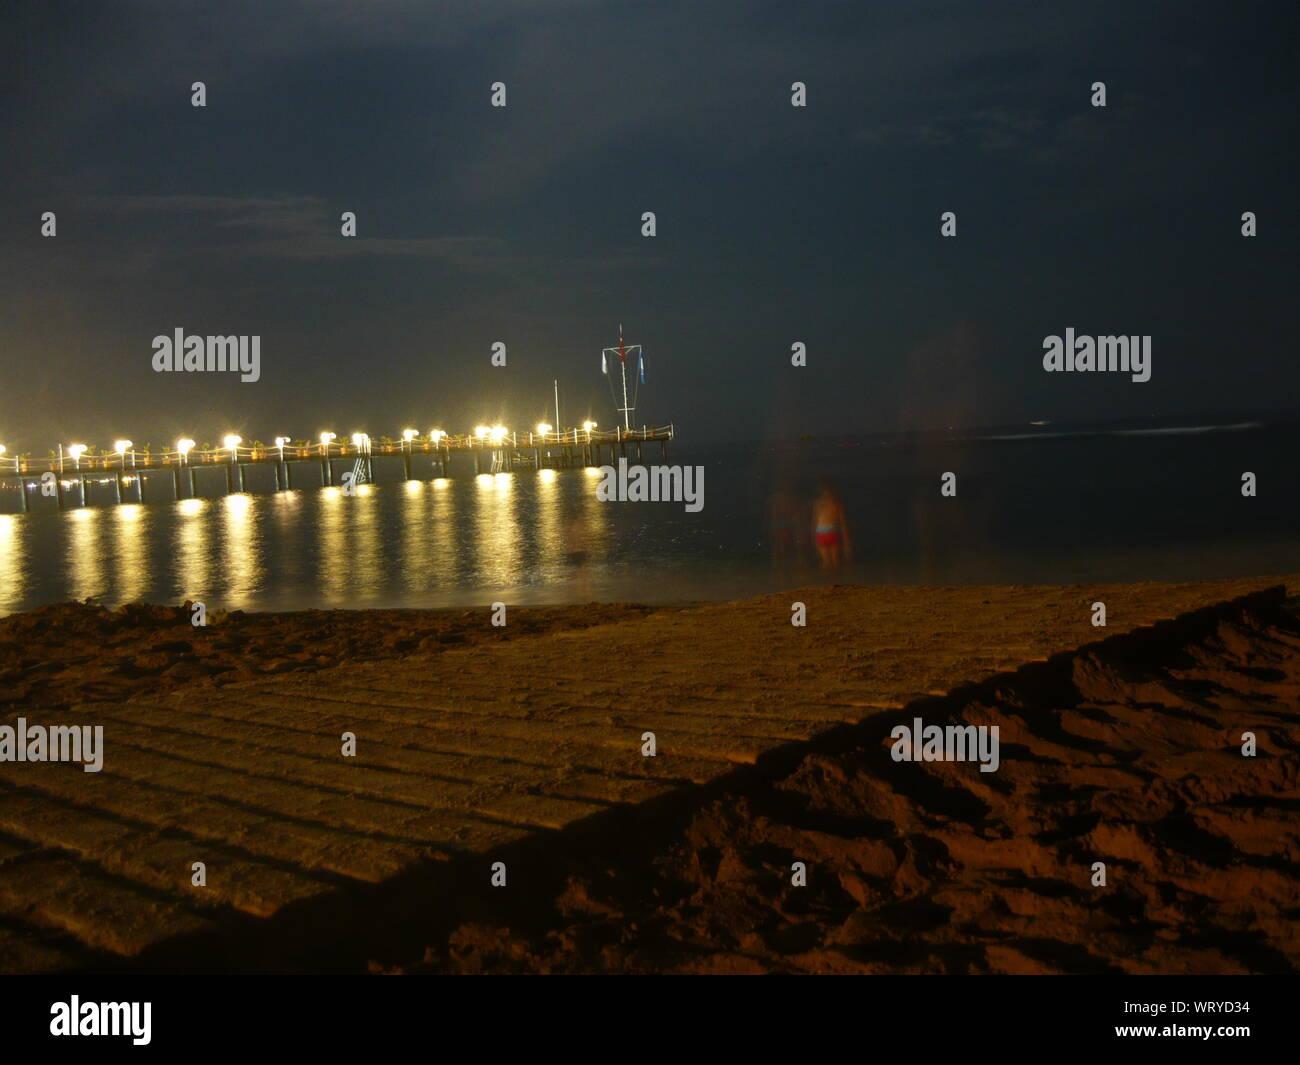 Illuminated Bridge At Night Stock Photo